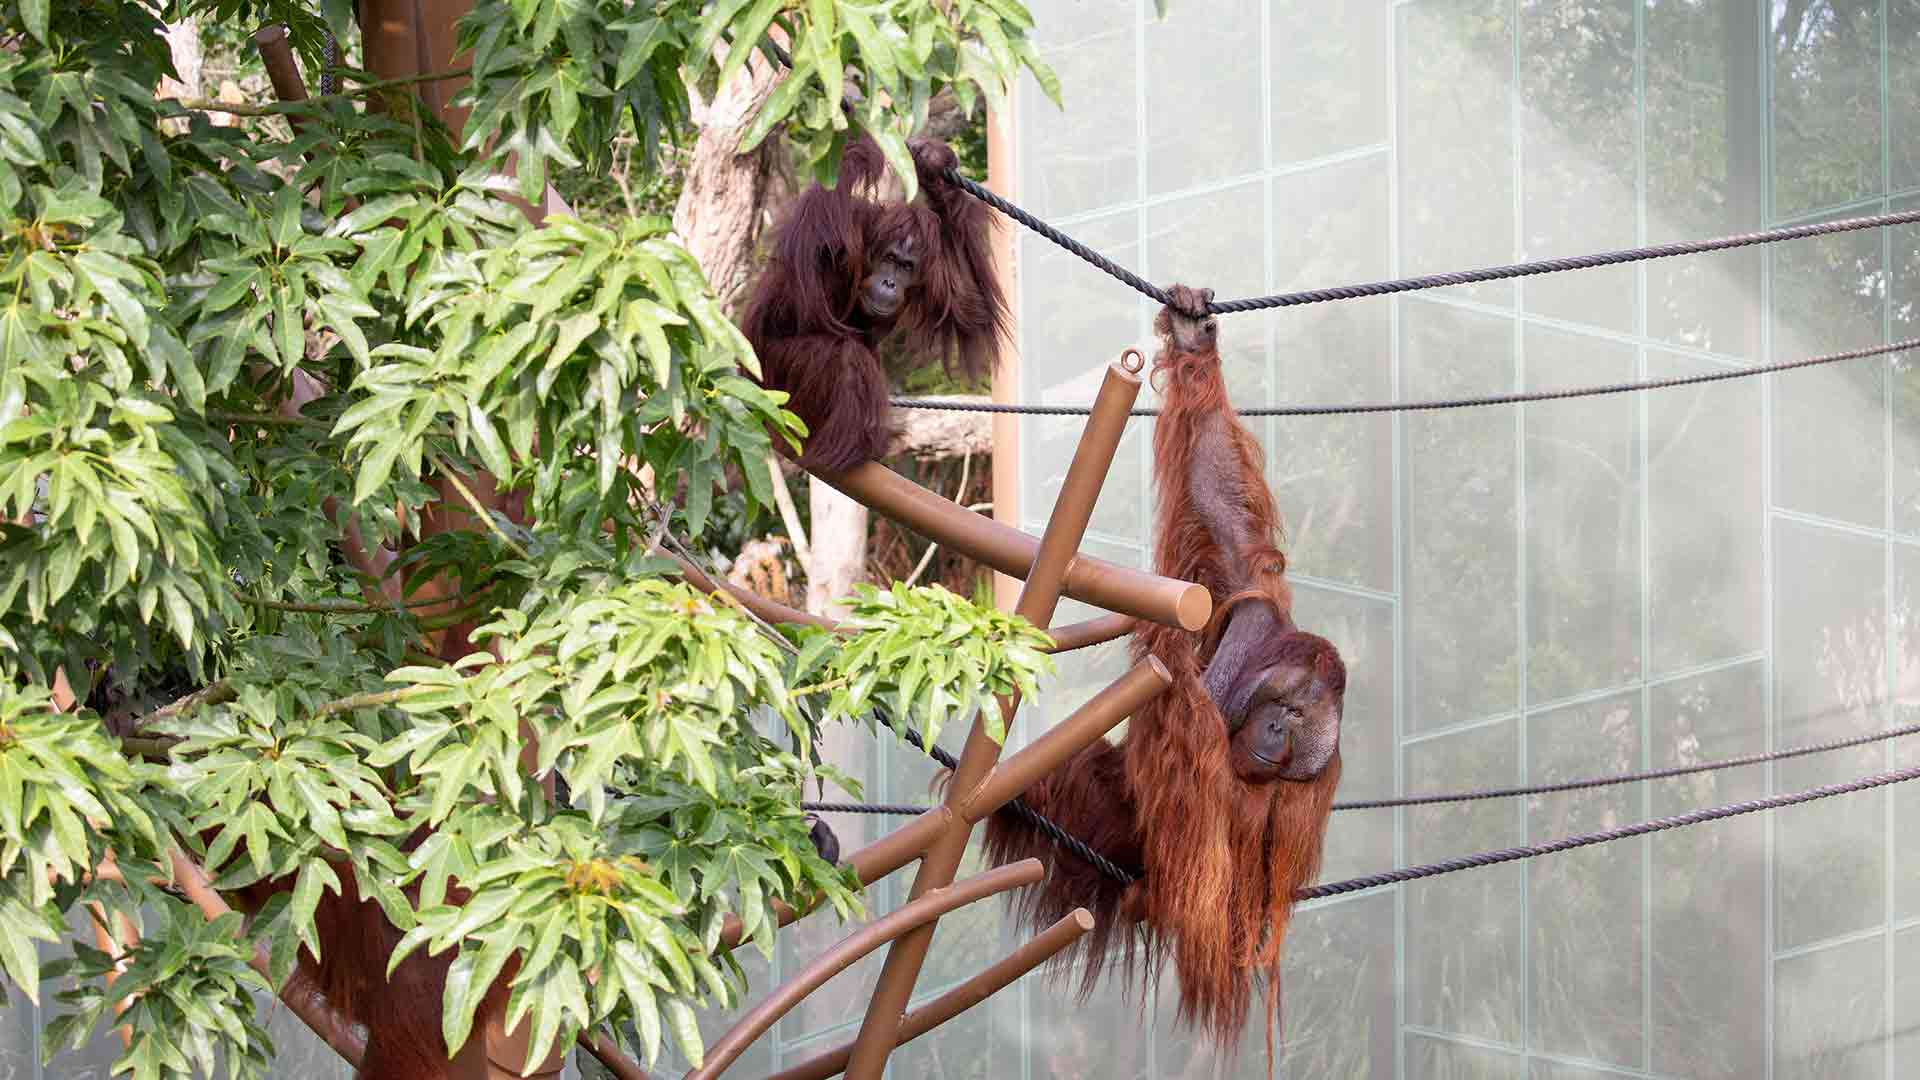 https://rfacdn.nz/zoo/assets/media/orangutan-move-gallery-1.jpg